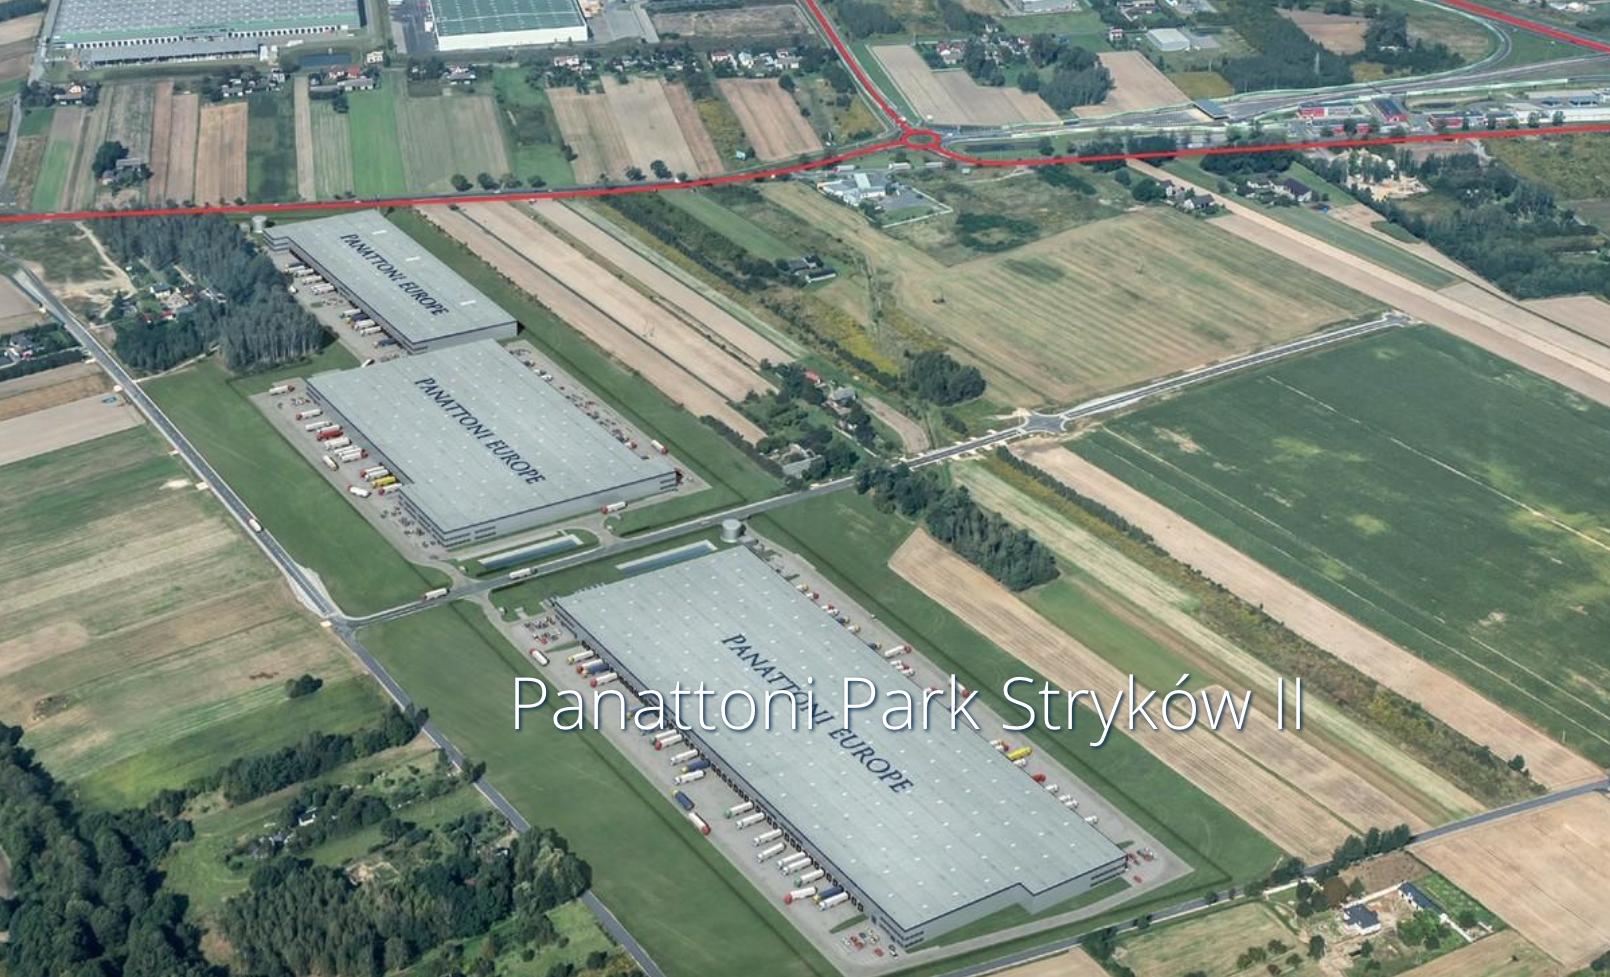 Panattoni Park Stryków II